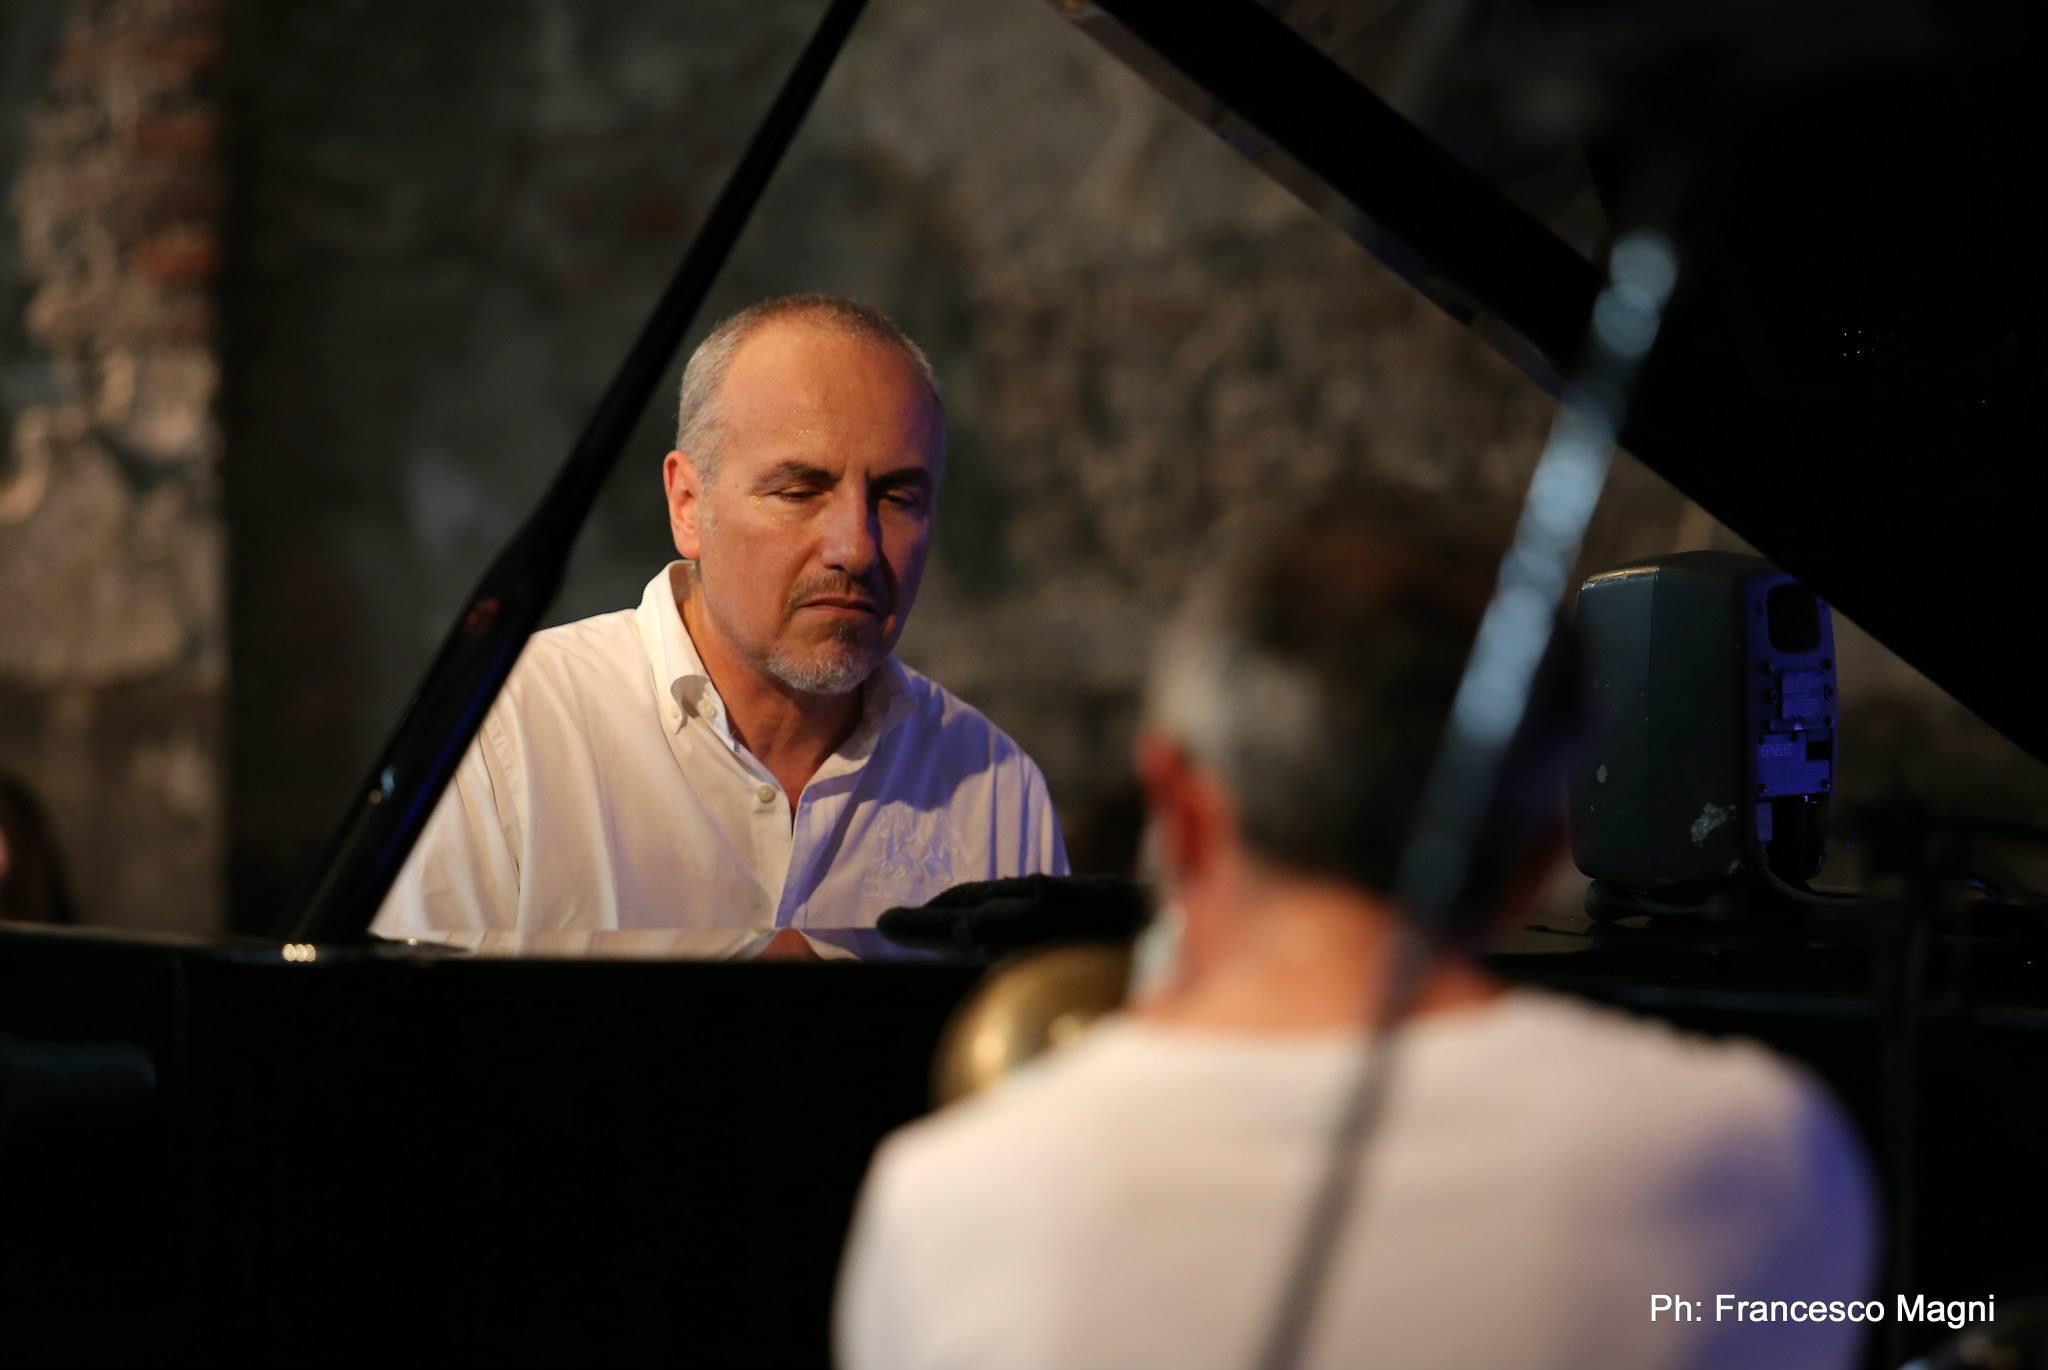 Fresu e Rea @ Presentazione Umbria Jazz 2015 ph Francesco Magni